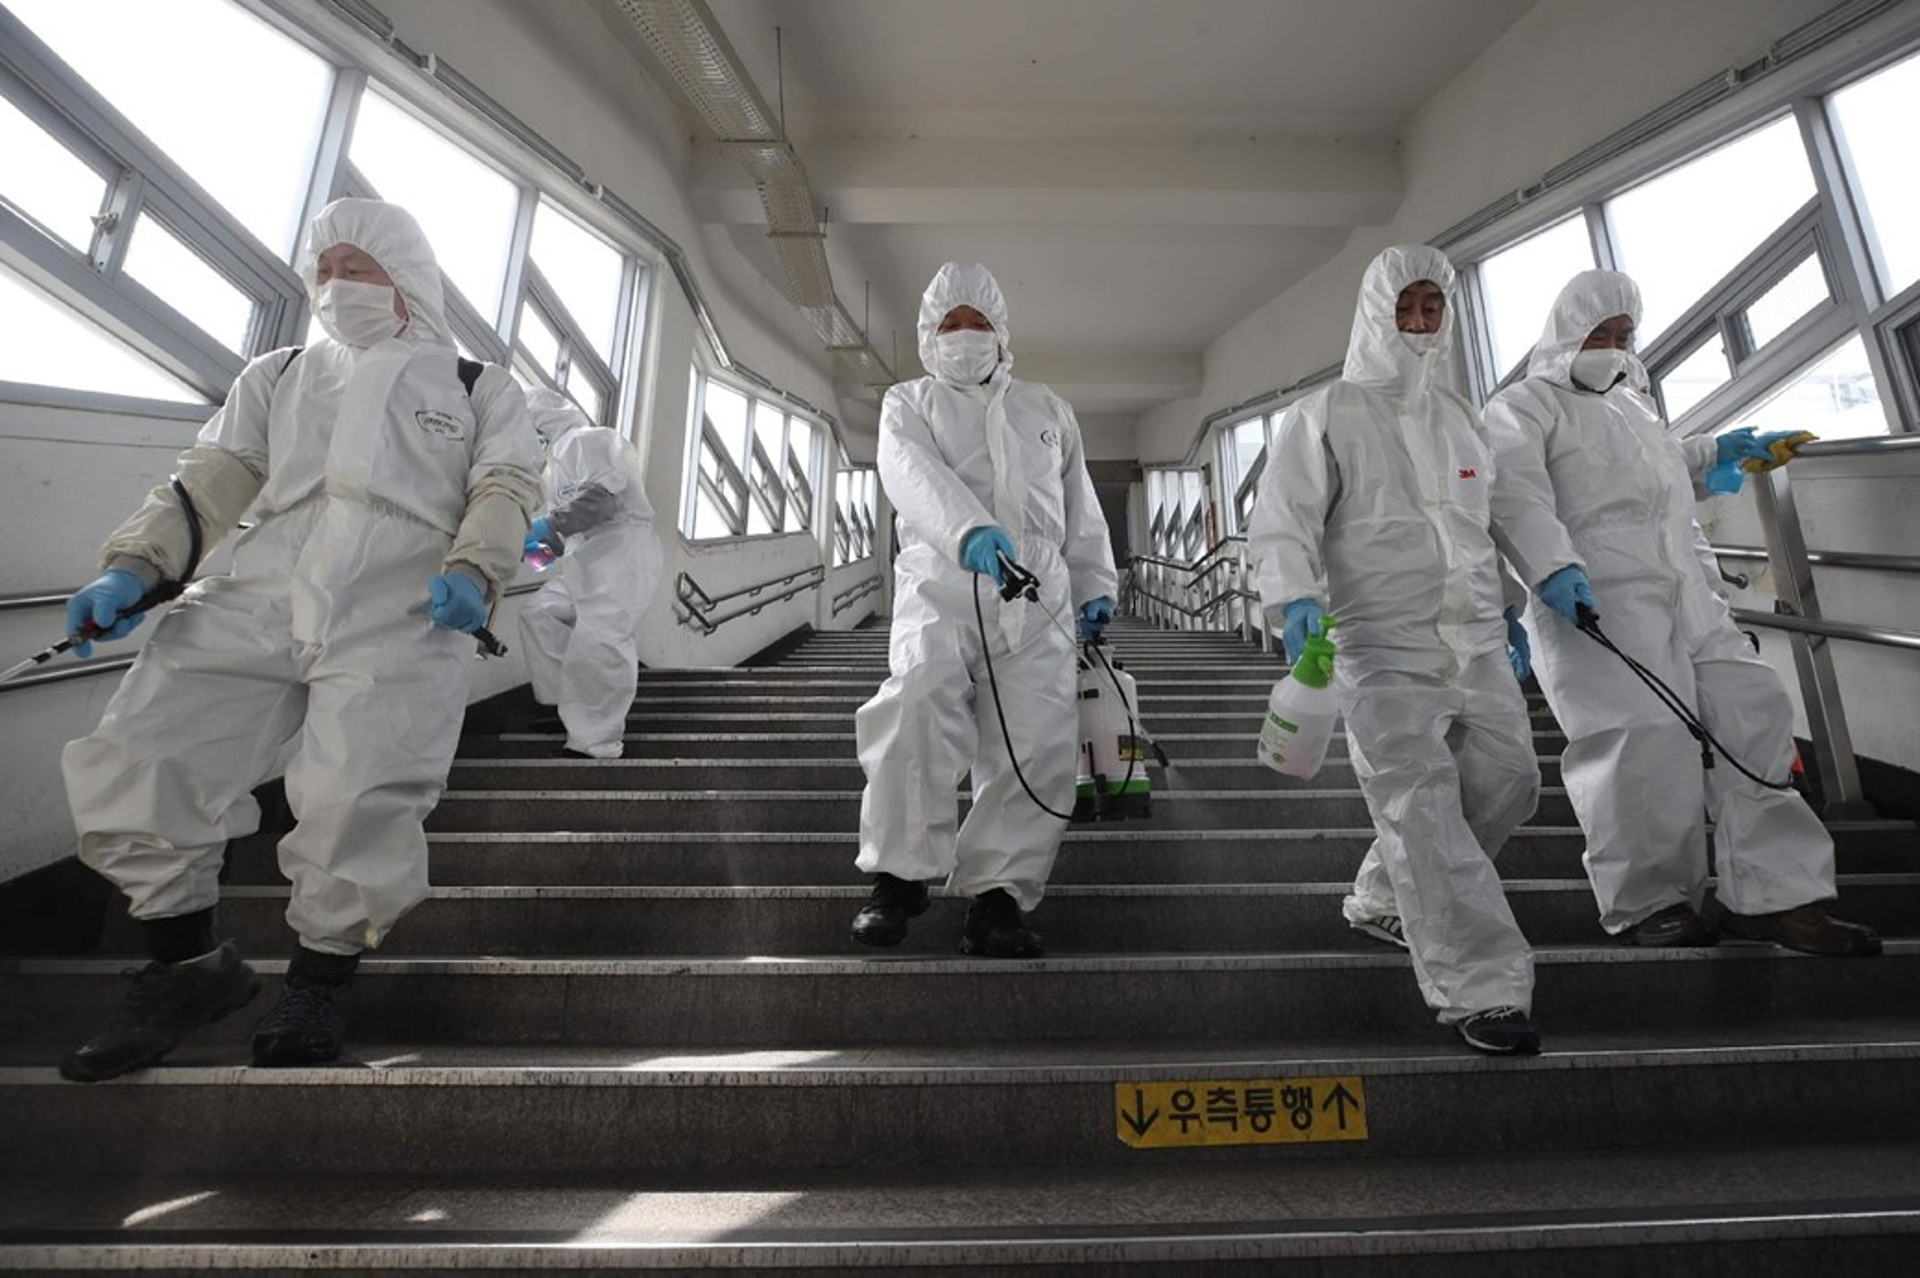 Limpeza de metrô em Seoul, na Coreia do Sul. (Fonte: YONHAP/AFP)